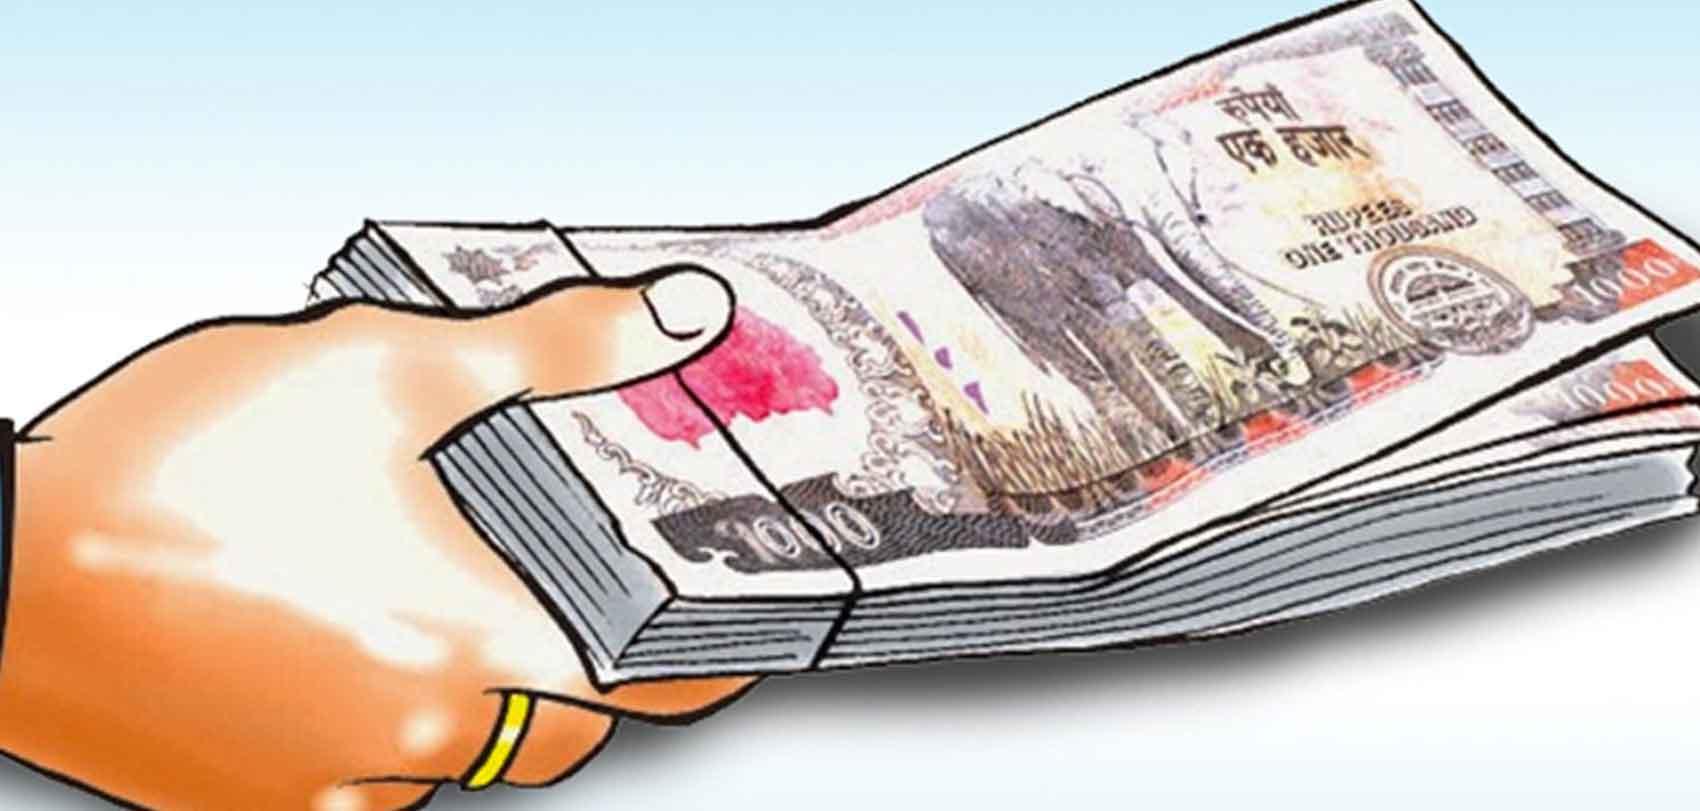 सामाजिक सुरक्षा भत्ताको बेरुजु ९ अर्ब